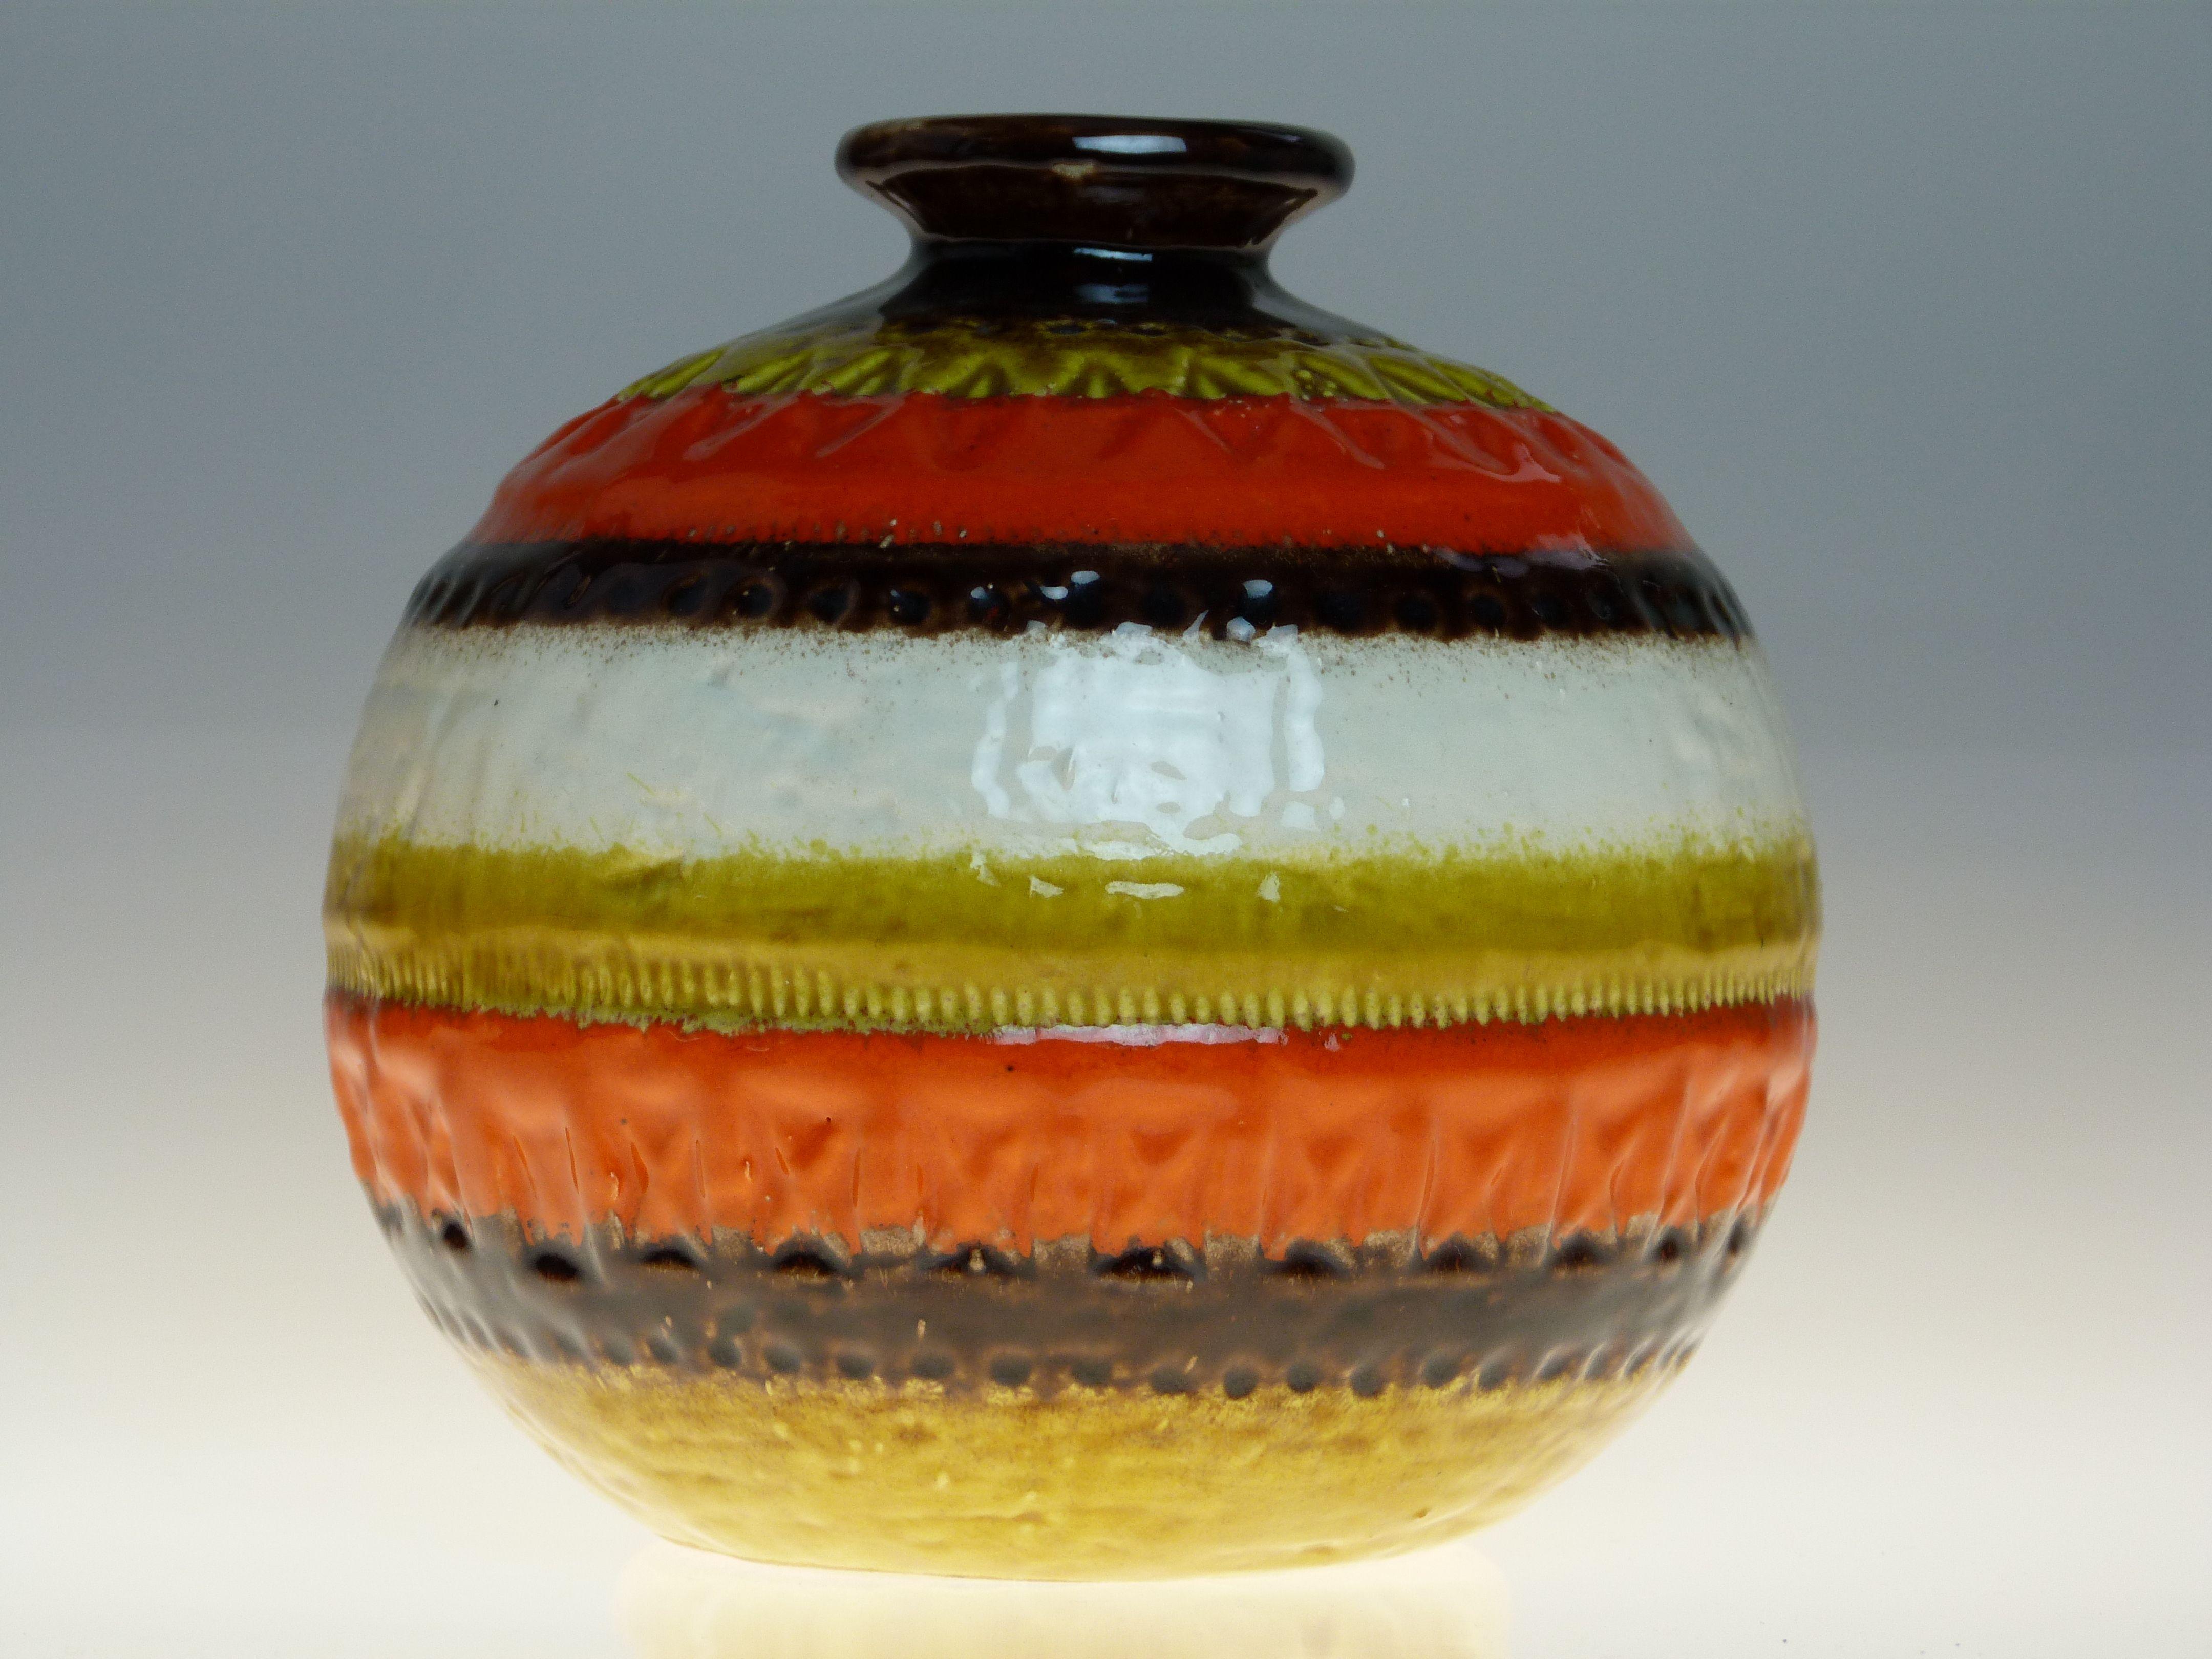 Bitossi Orange vase Aldo Londi. From the Funkyvintagelover